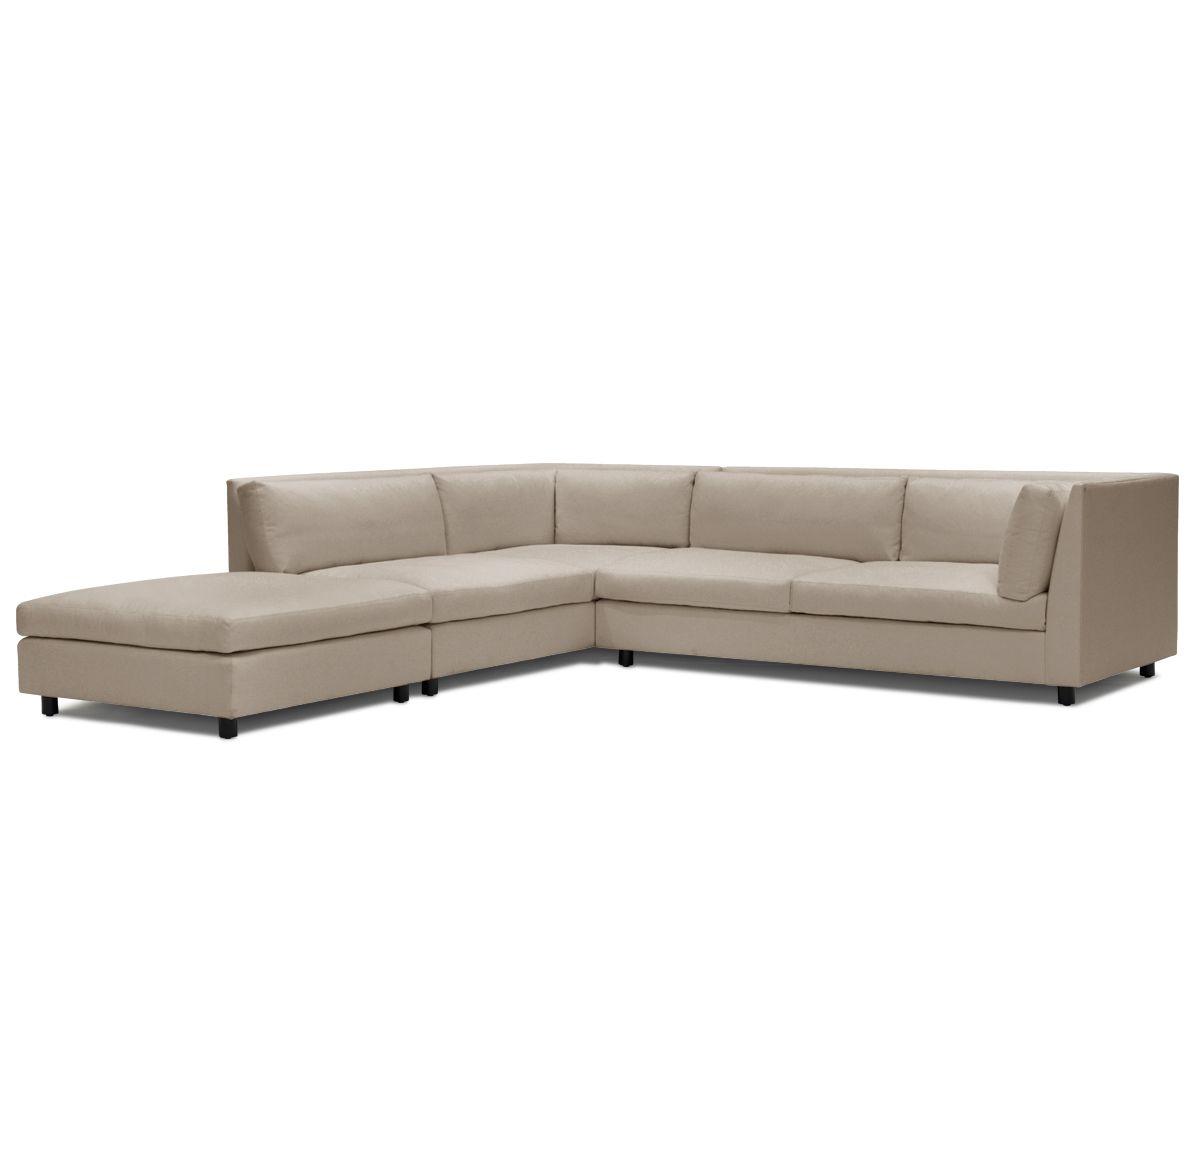 Franco Left Sectional Sofa